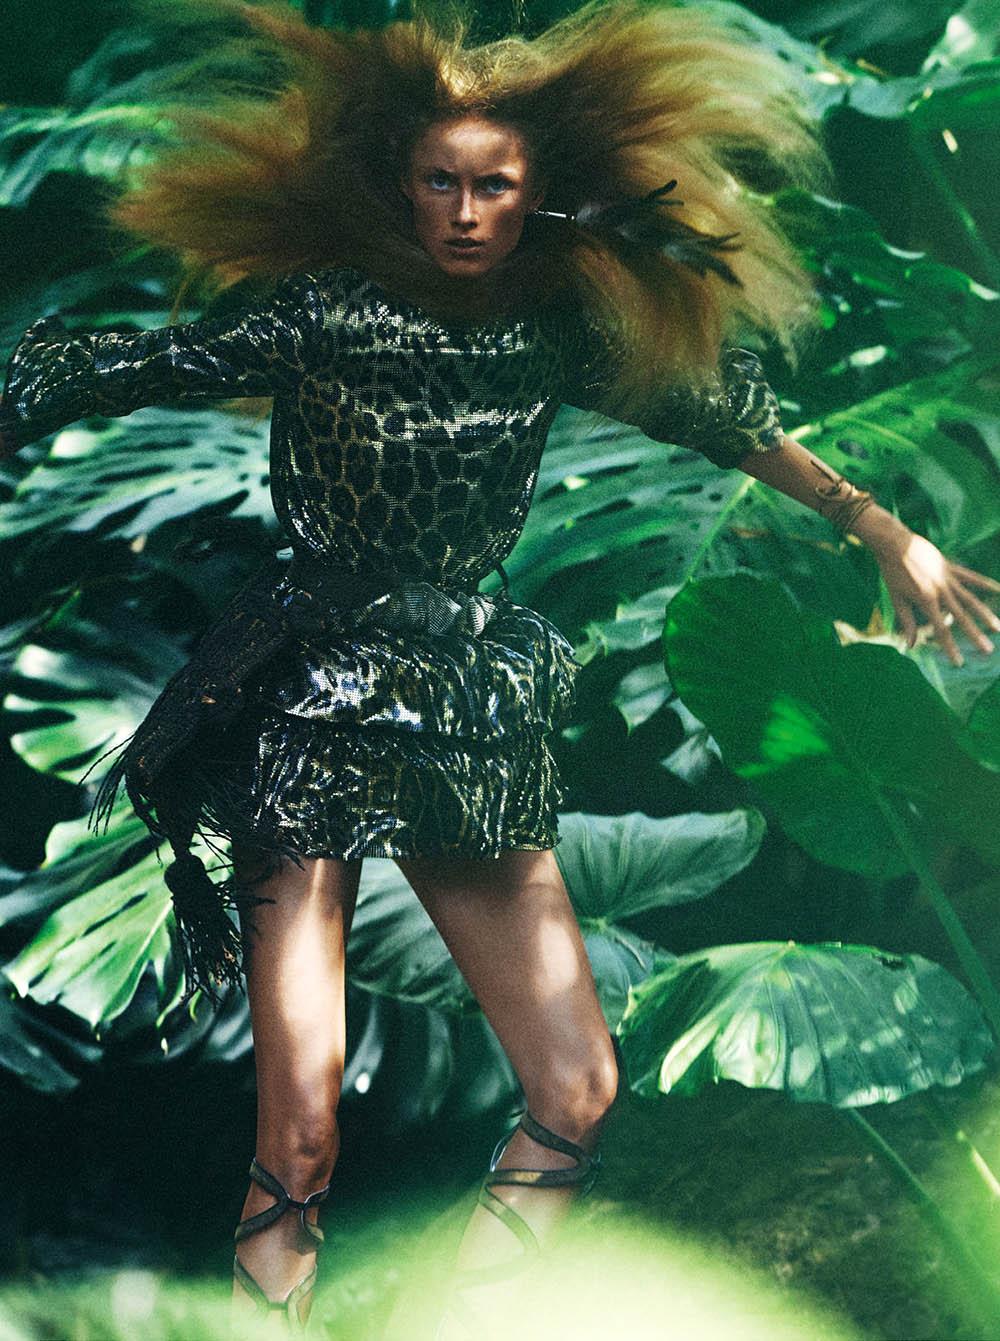 Rianne van Rompaey covers Vogue Paris May 2019 by Mikael Jansson